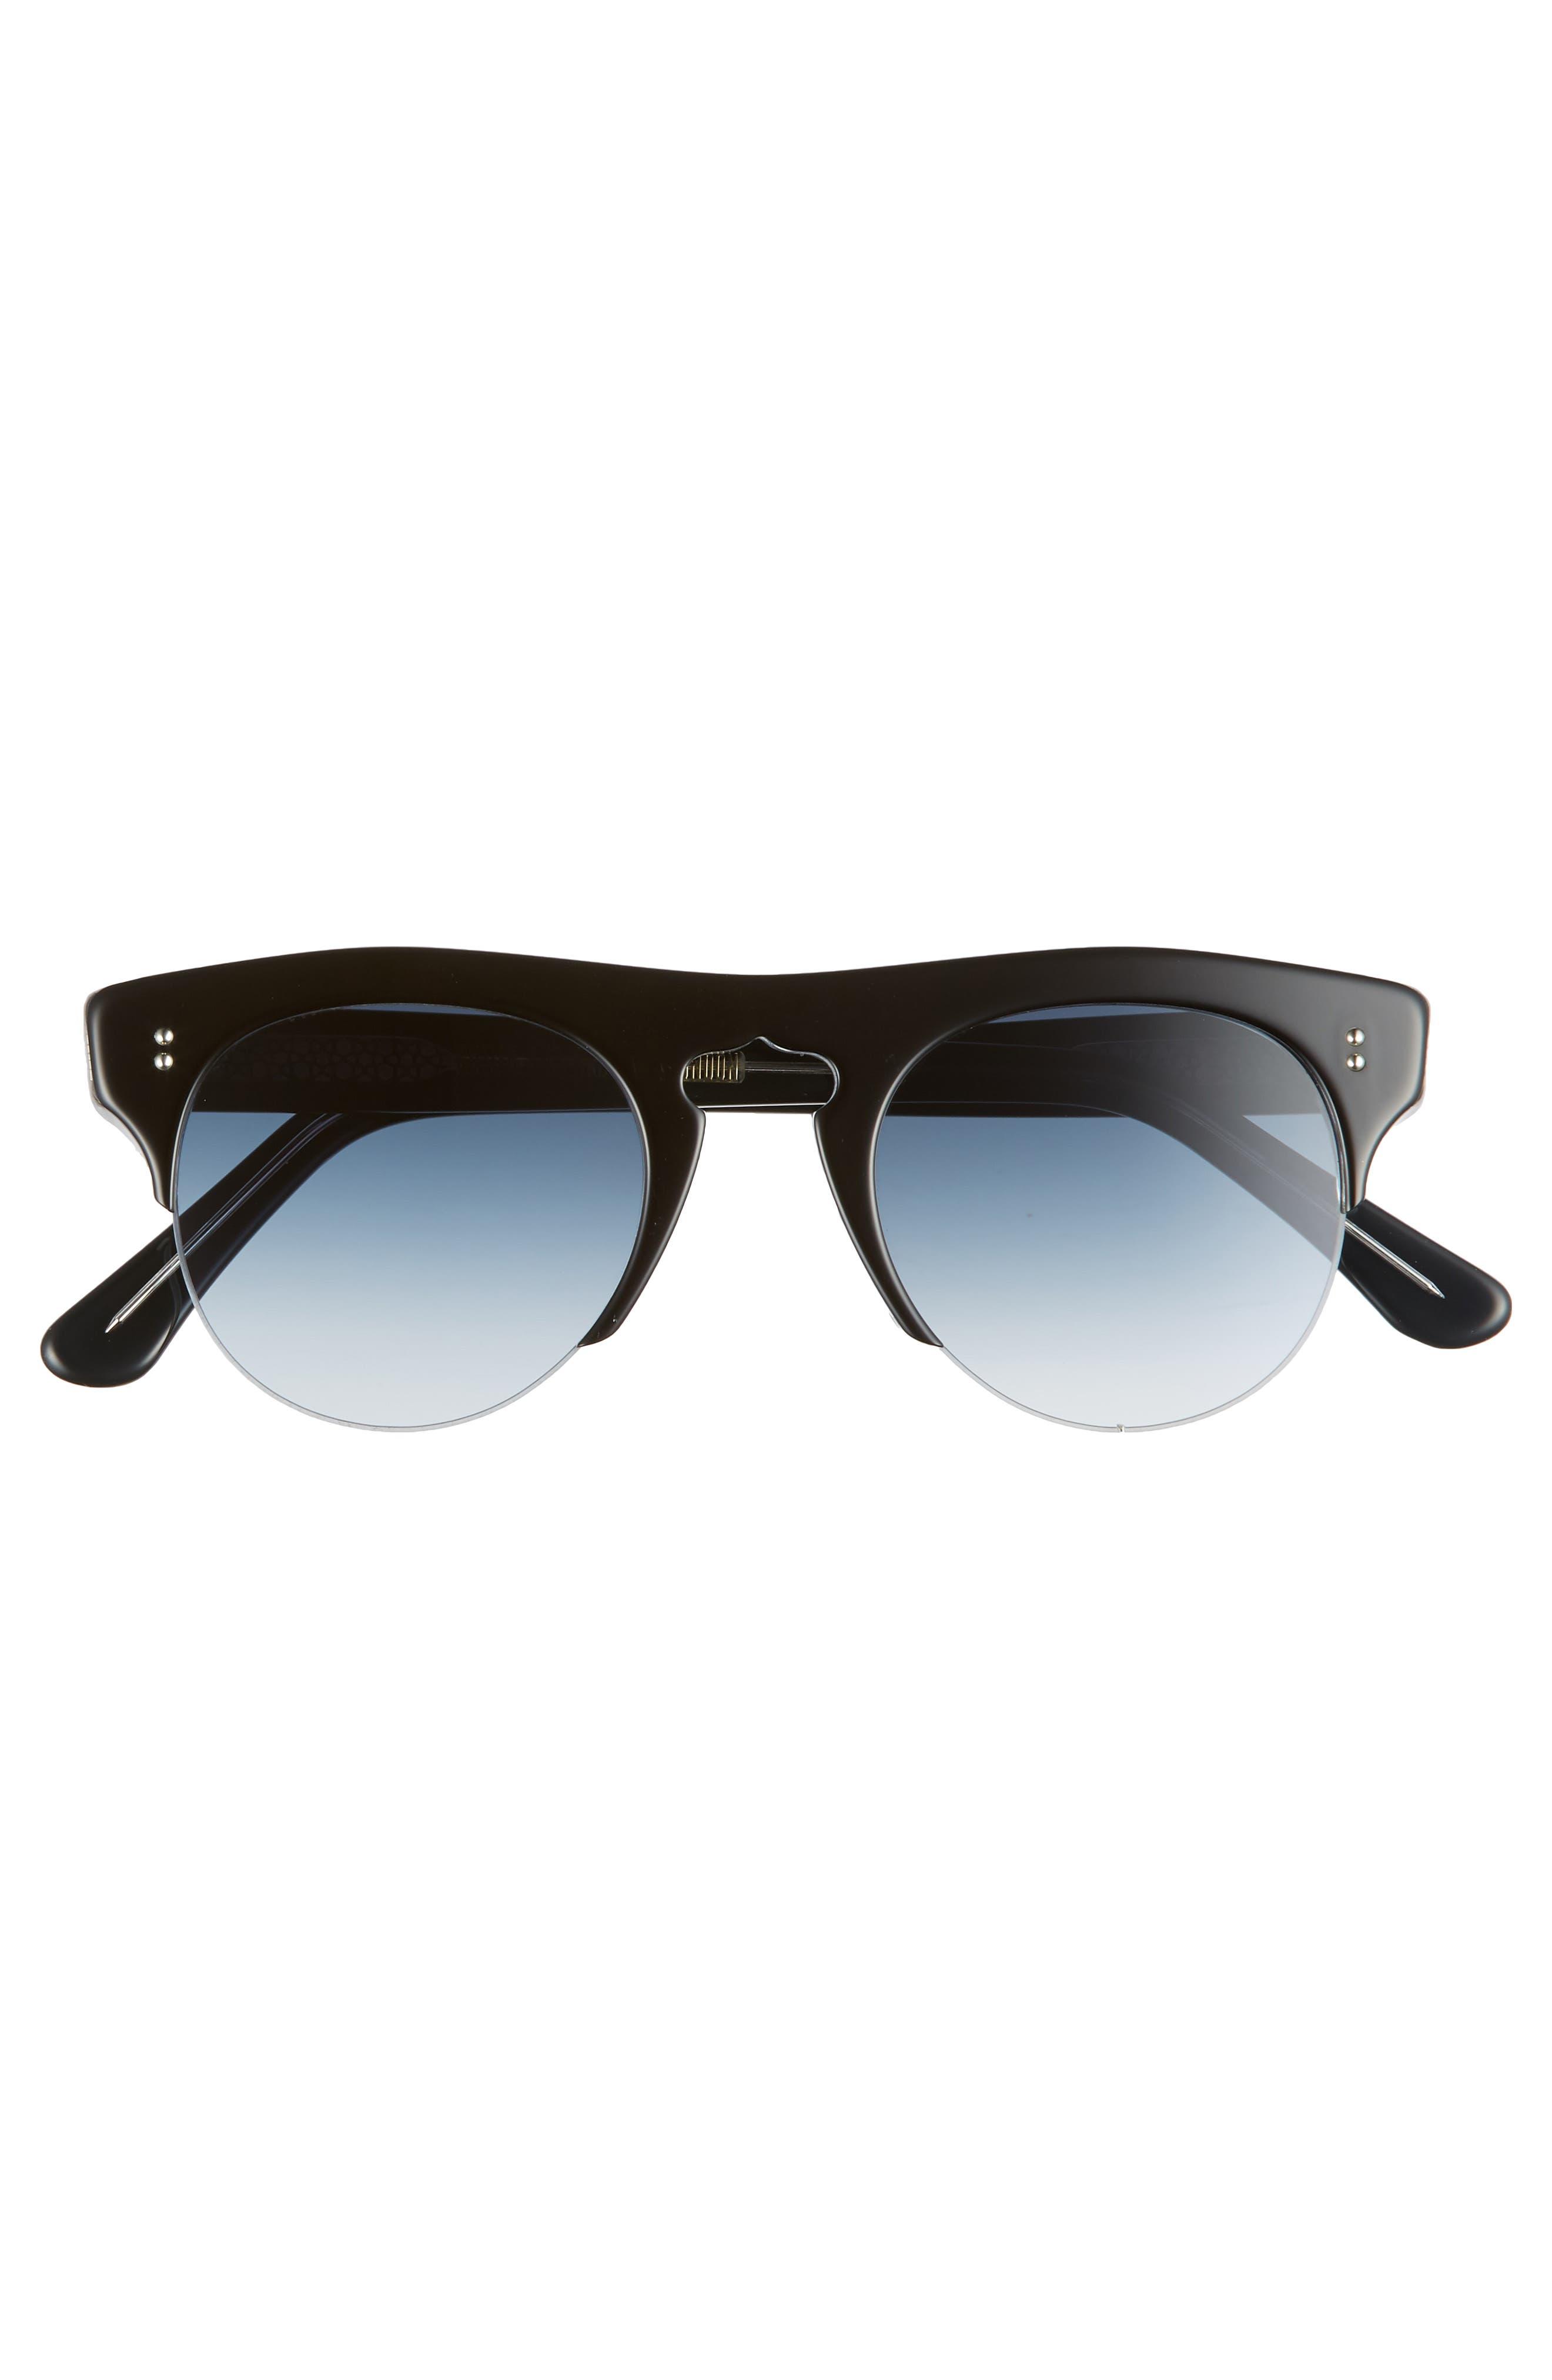 2870f1d512c All Men s Sunglasses  Sale